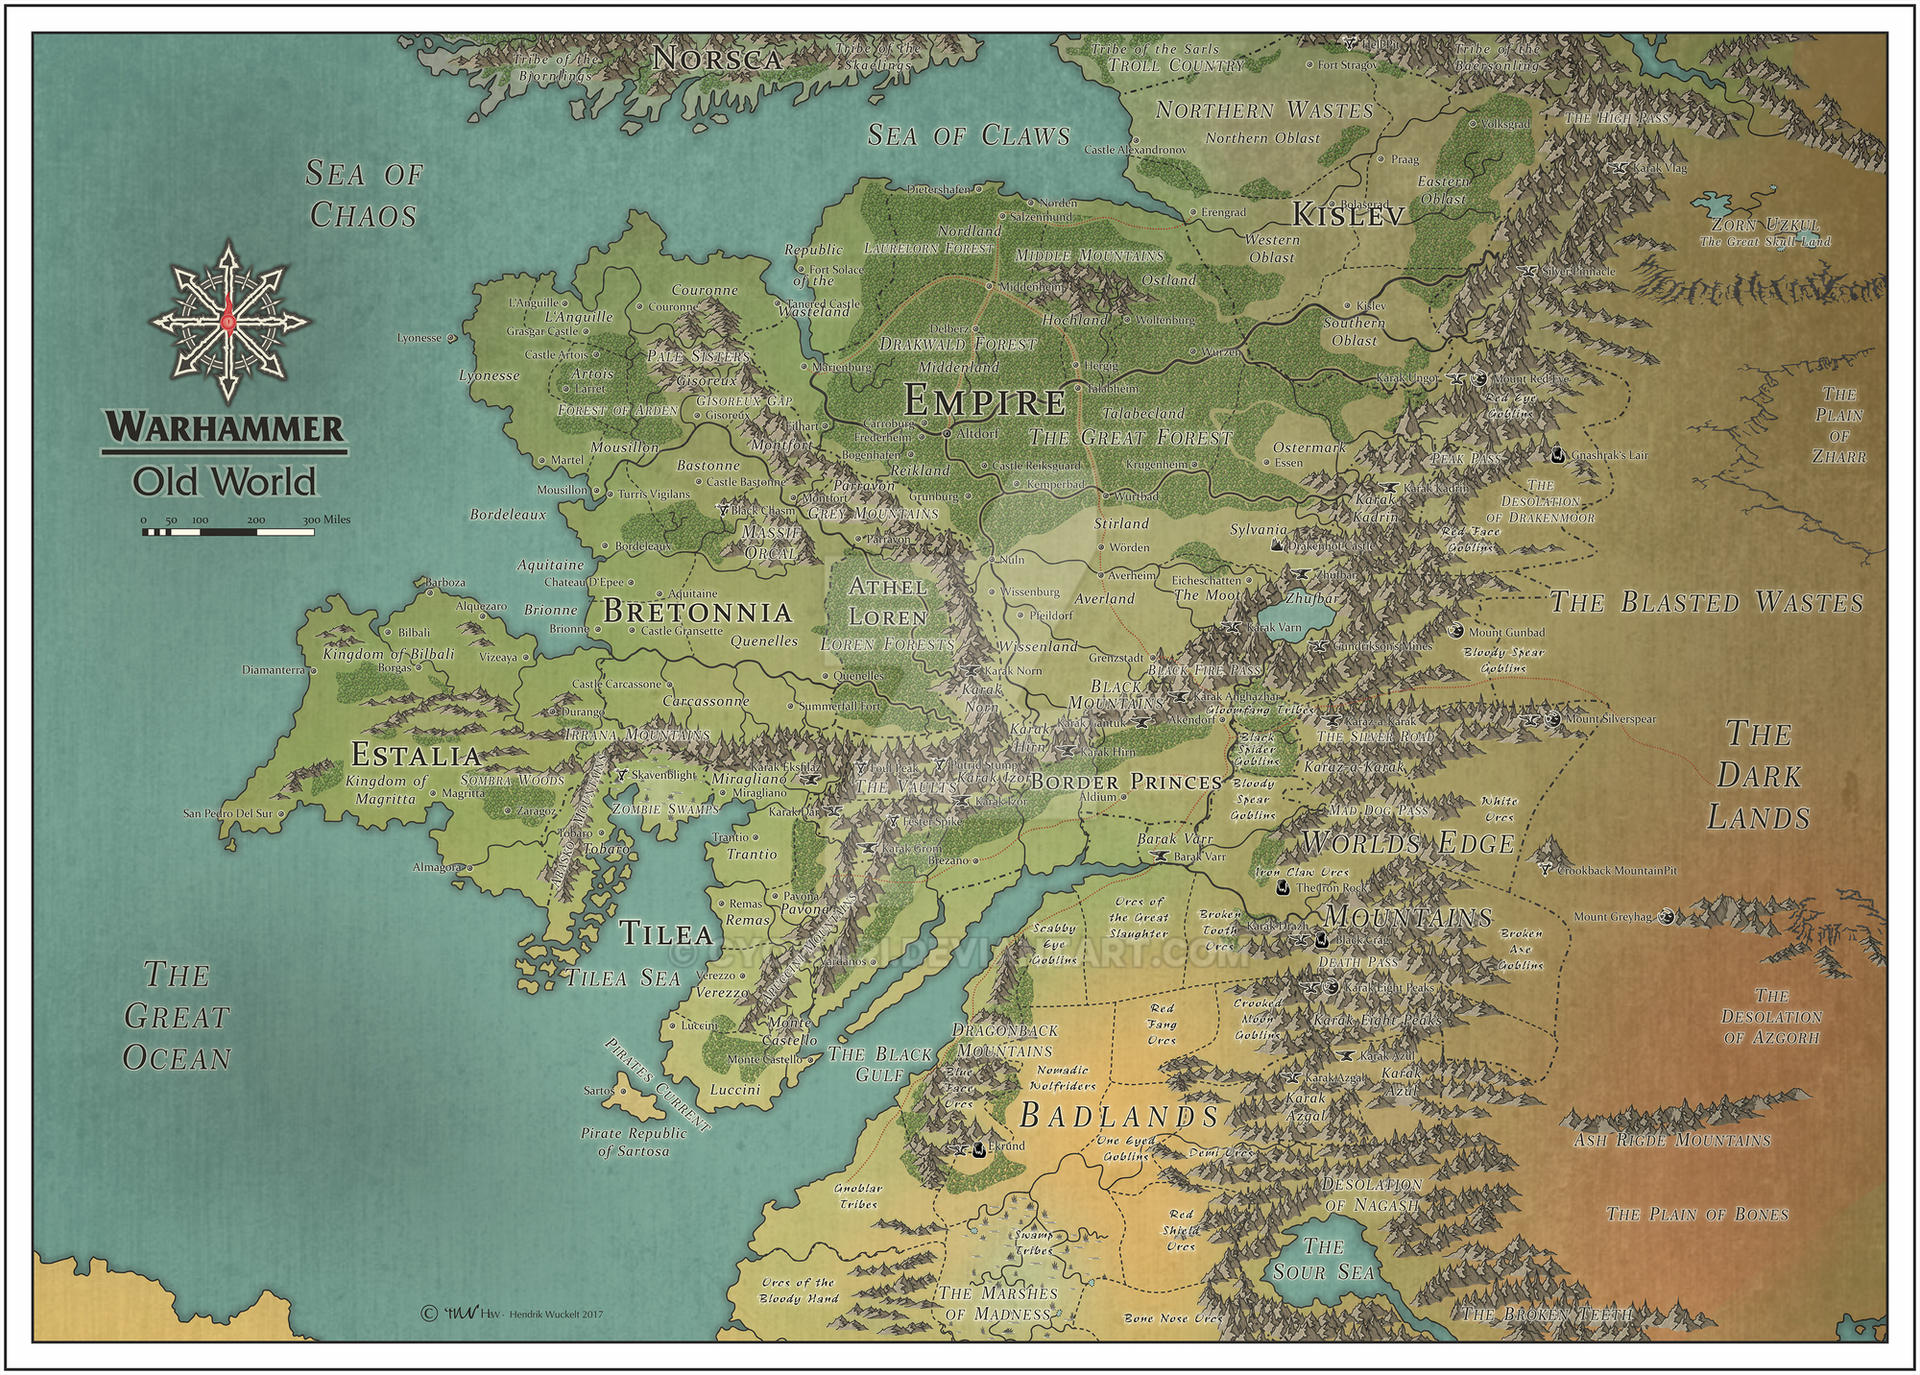 Old World Map Warhammer Warhammer   Old World   Color by Cyowari on DeviantArt